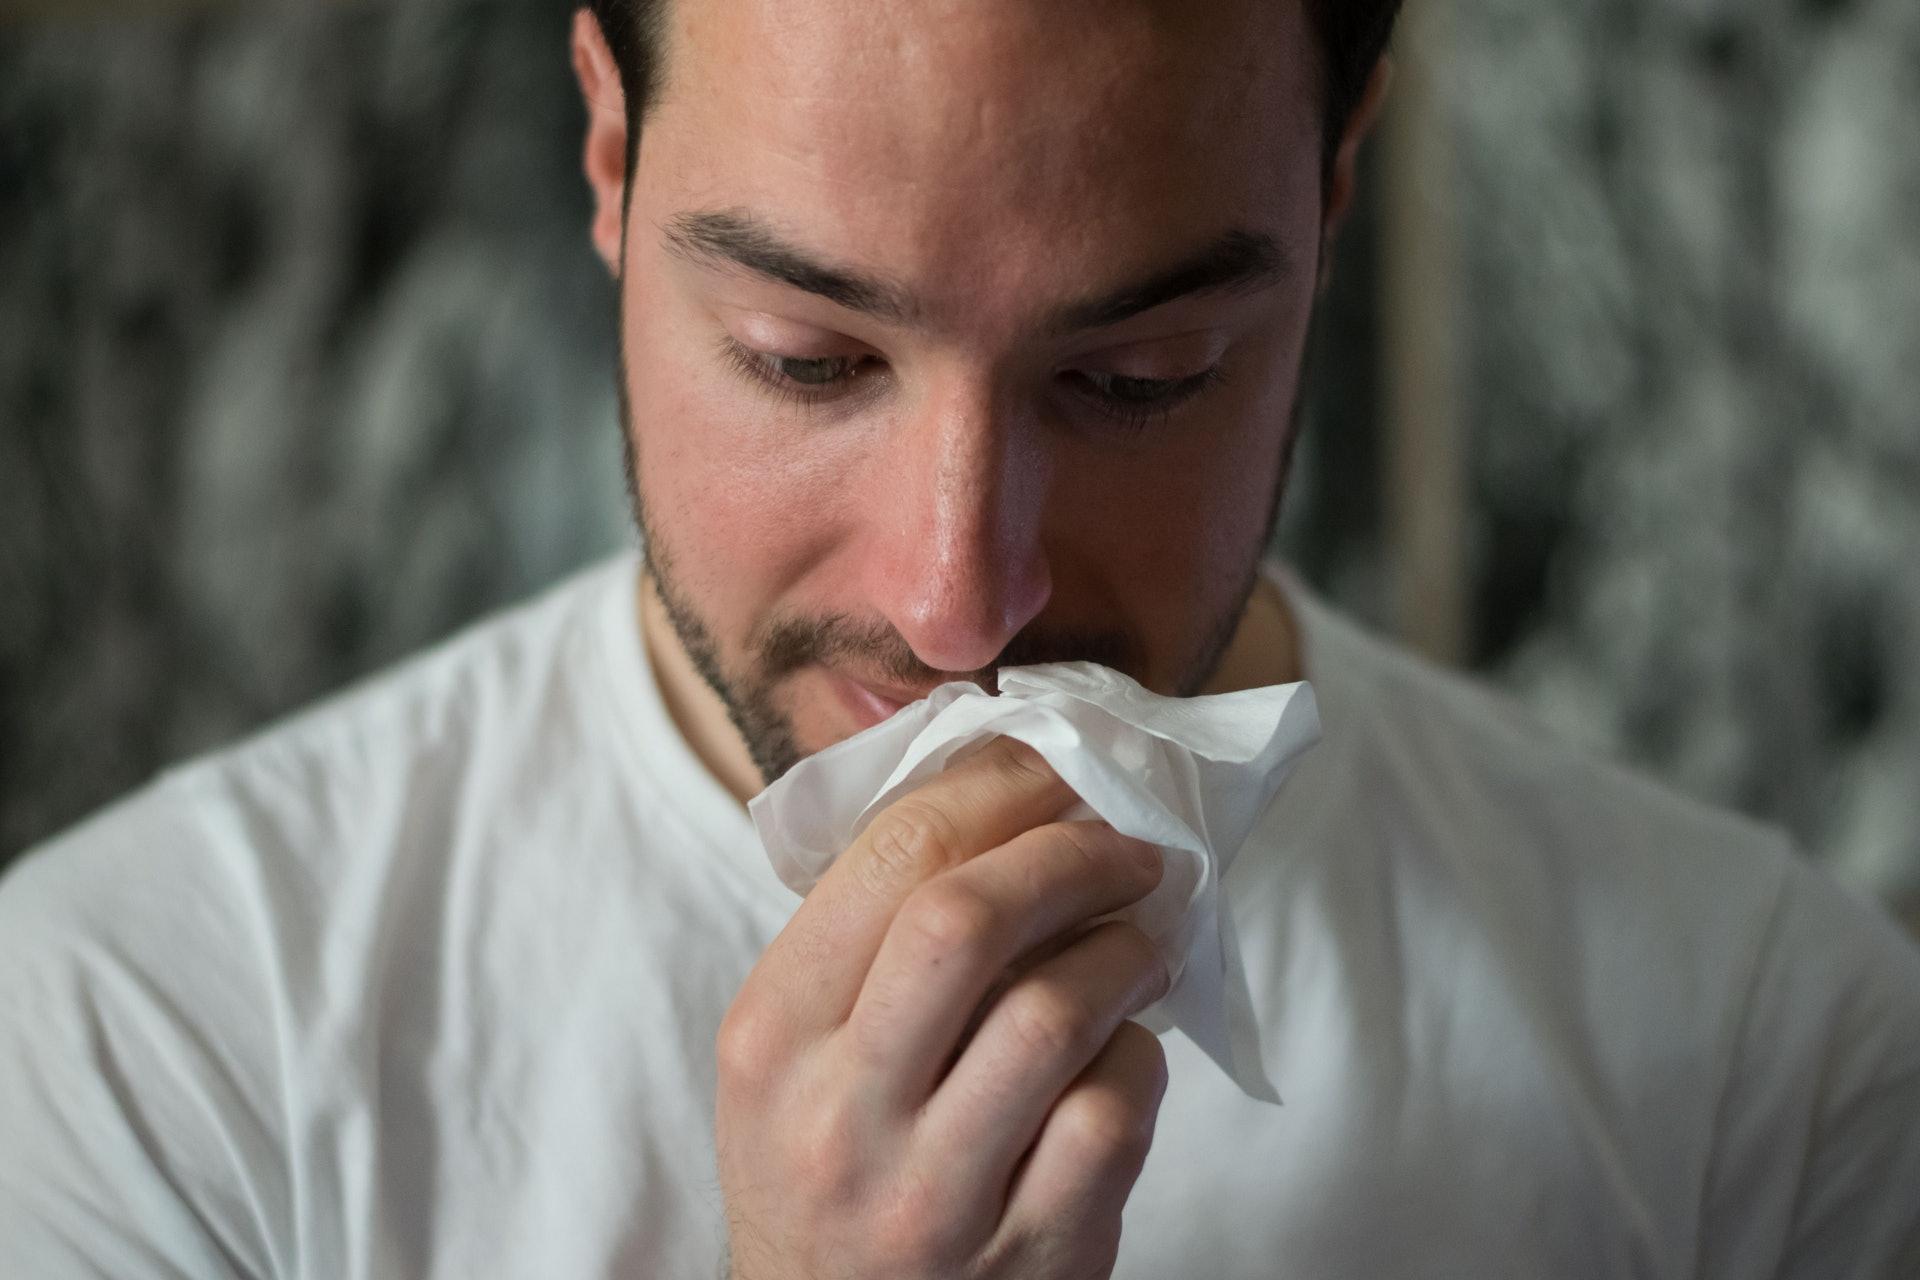 香港不少人有鼻敏感問題,與氣候濕熱也有關係。(Brittany Colette/unsplash)